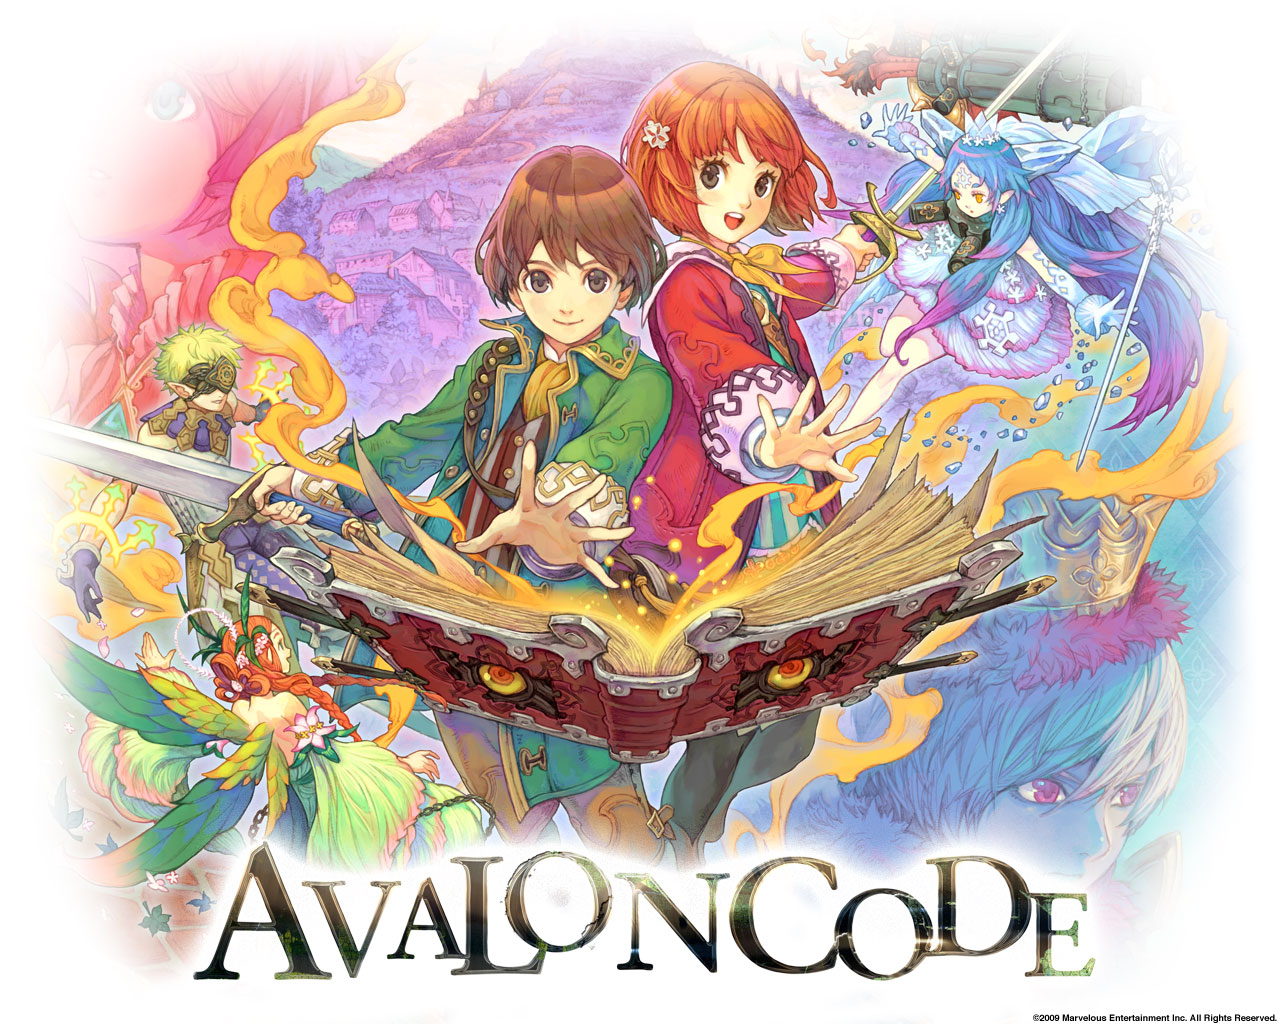 Avalon Code Fiche RPG (reviews, previews ...